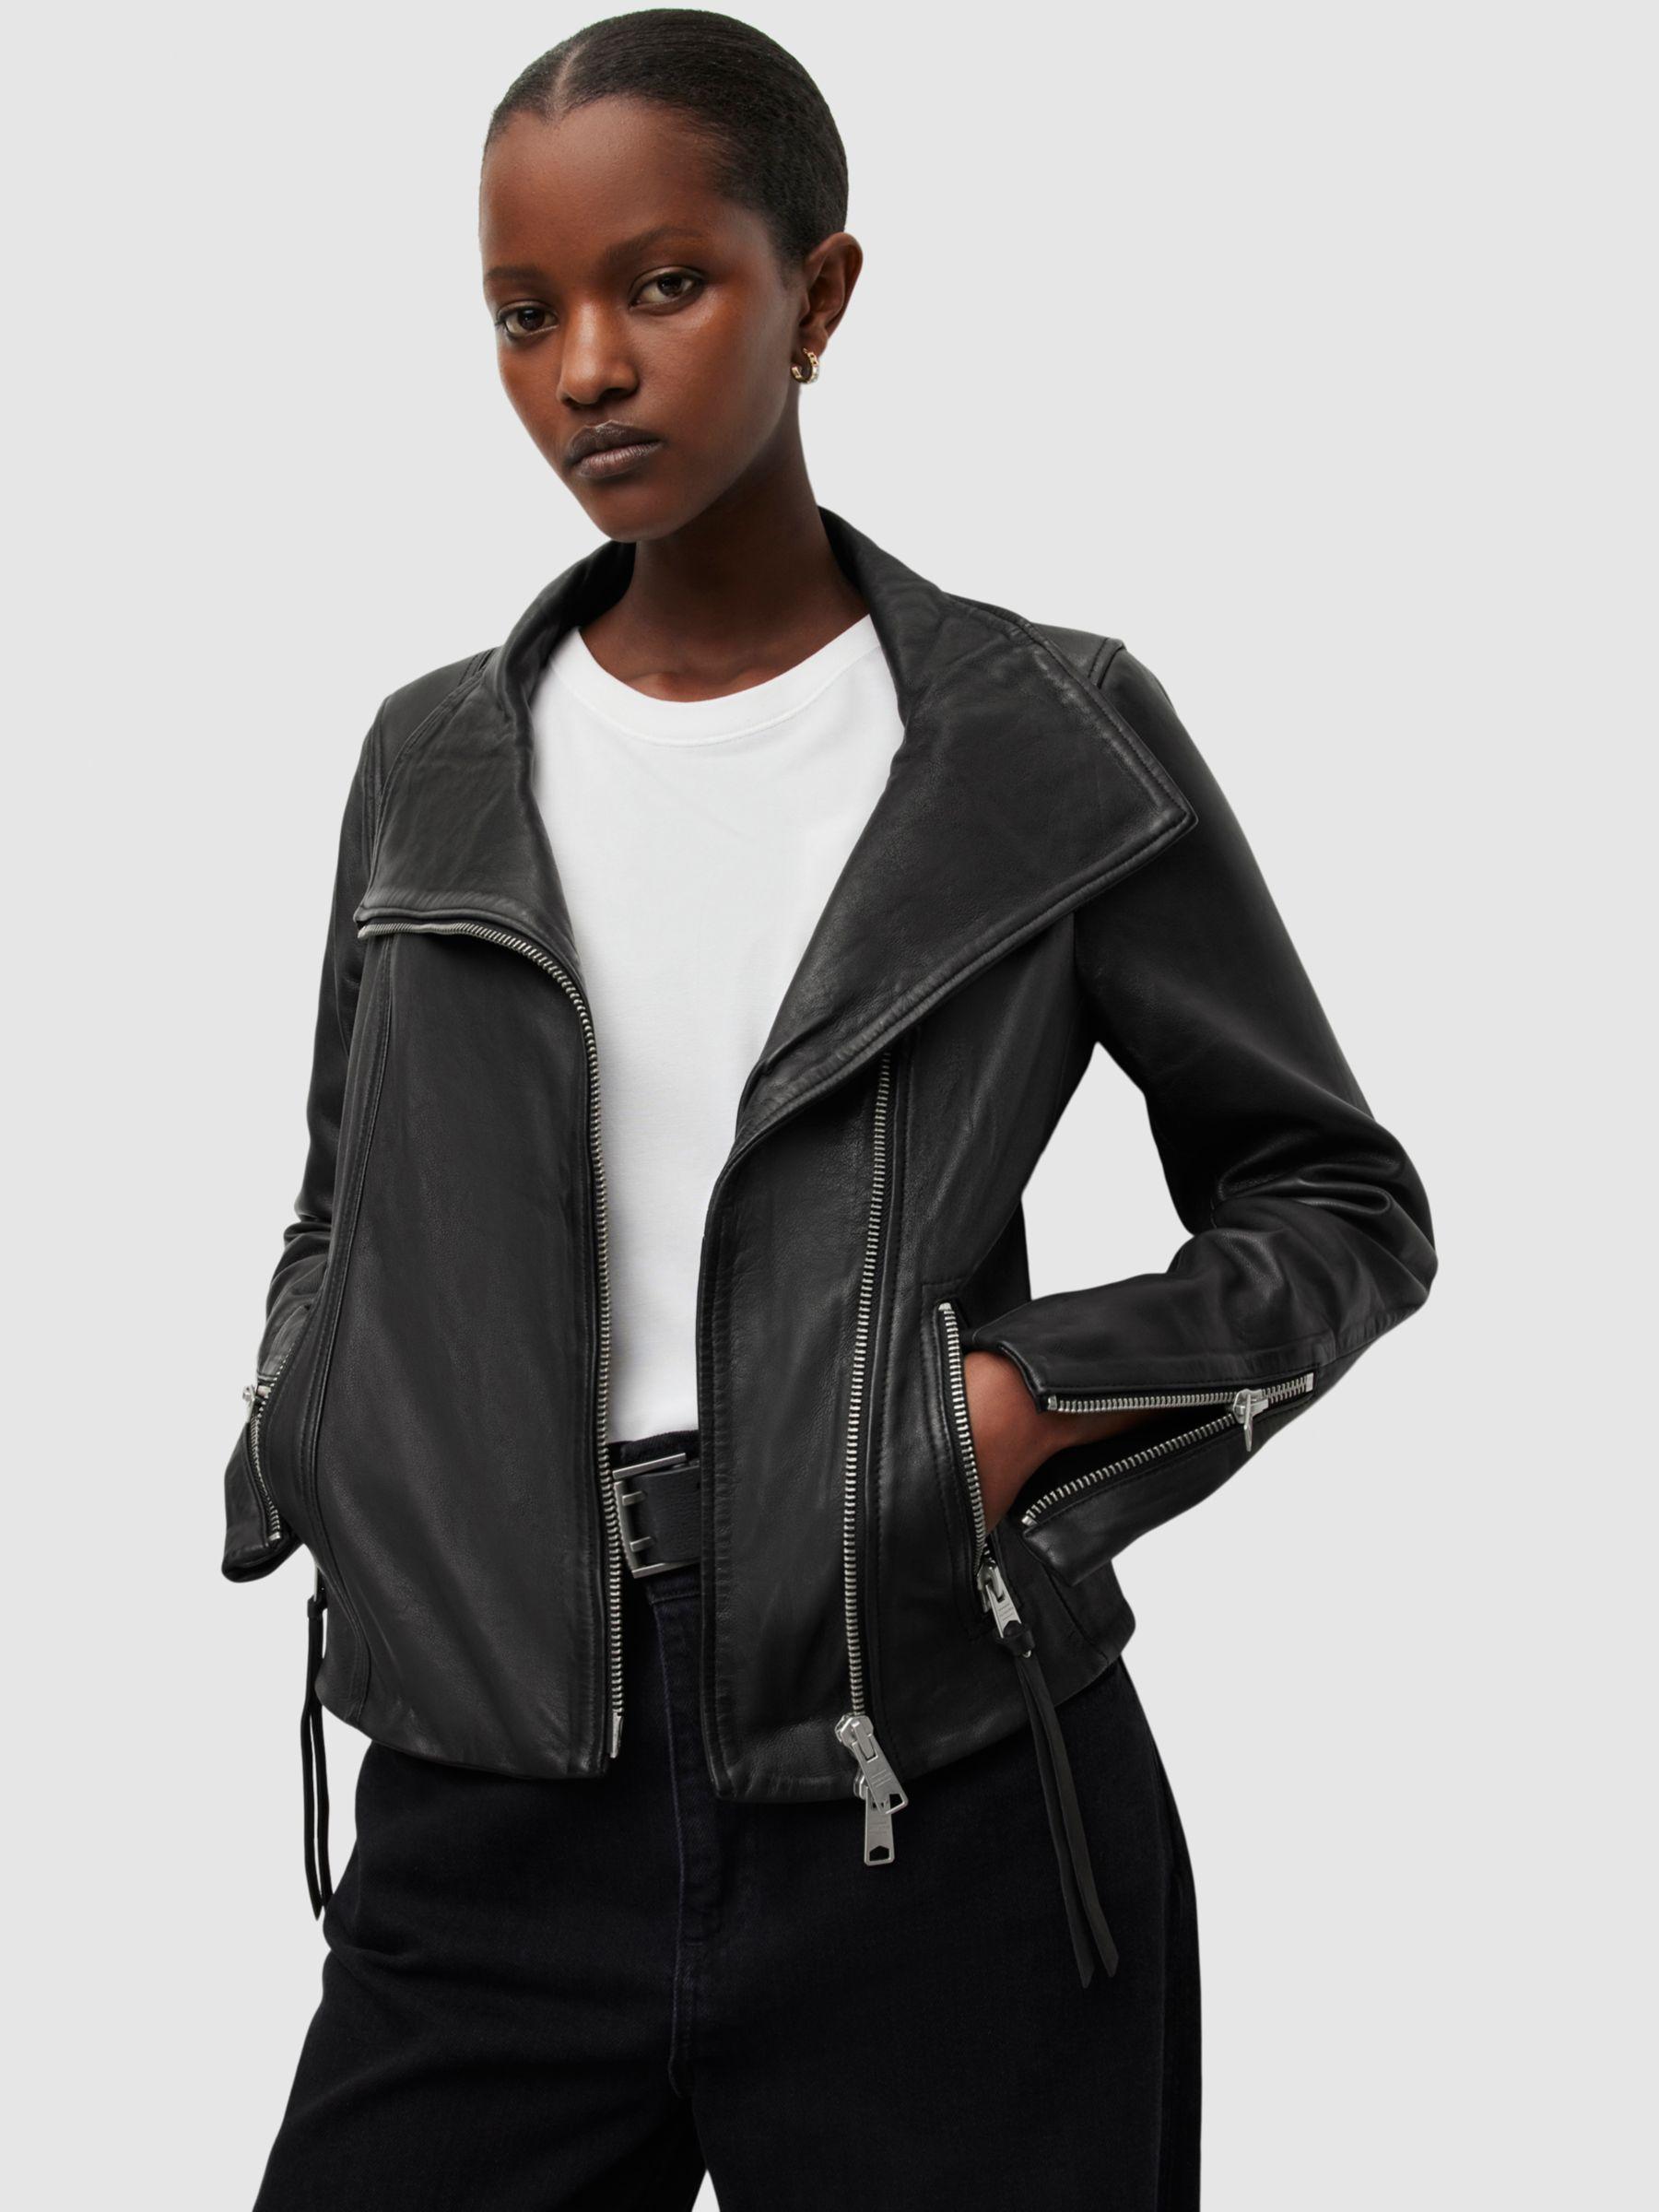 AllSaints AllSaints Ellis Leather Biker Jacket, Black